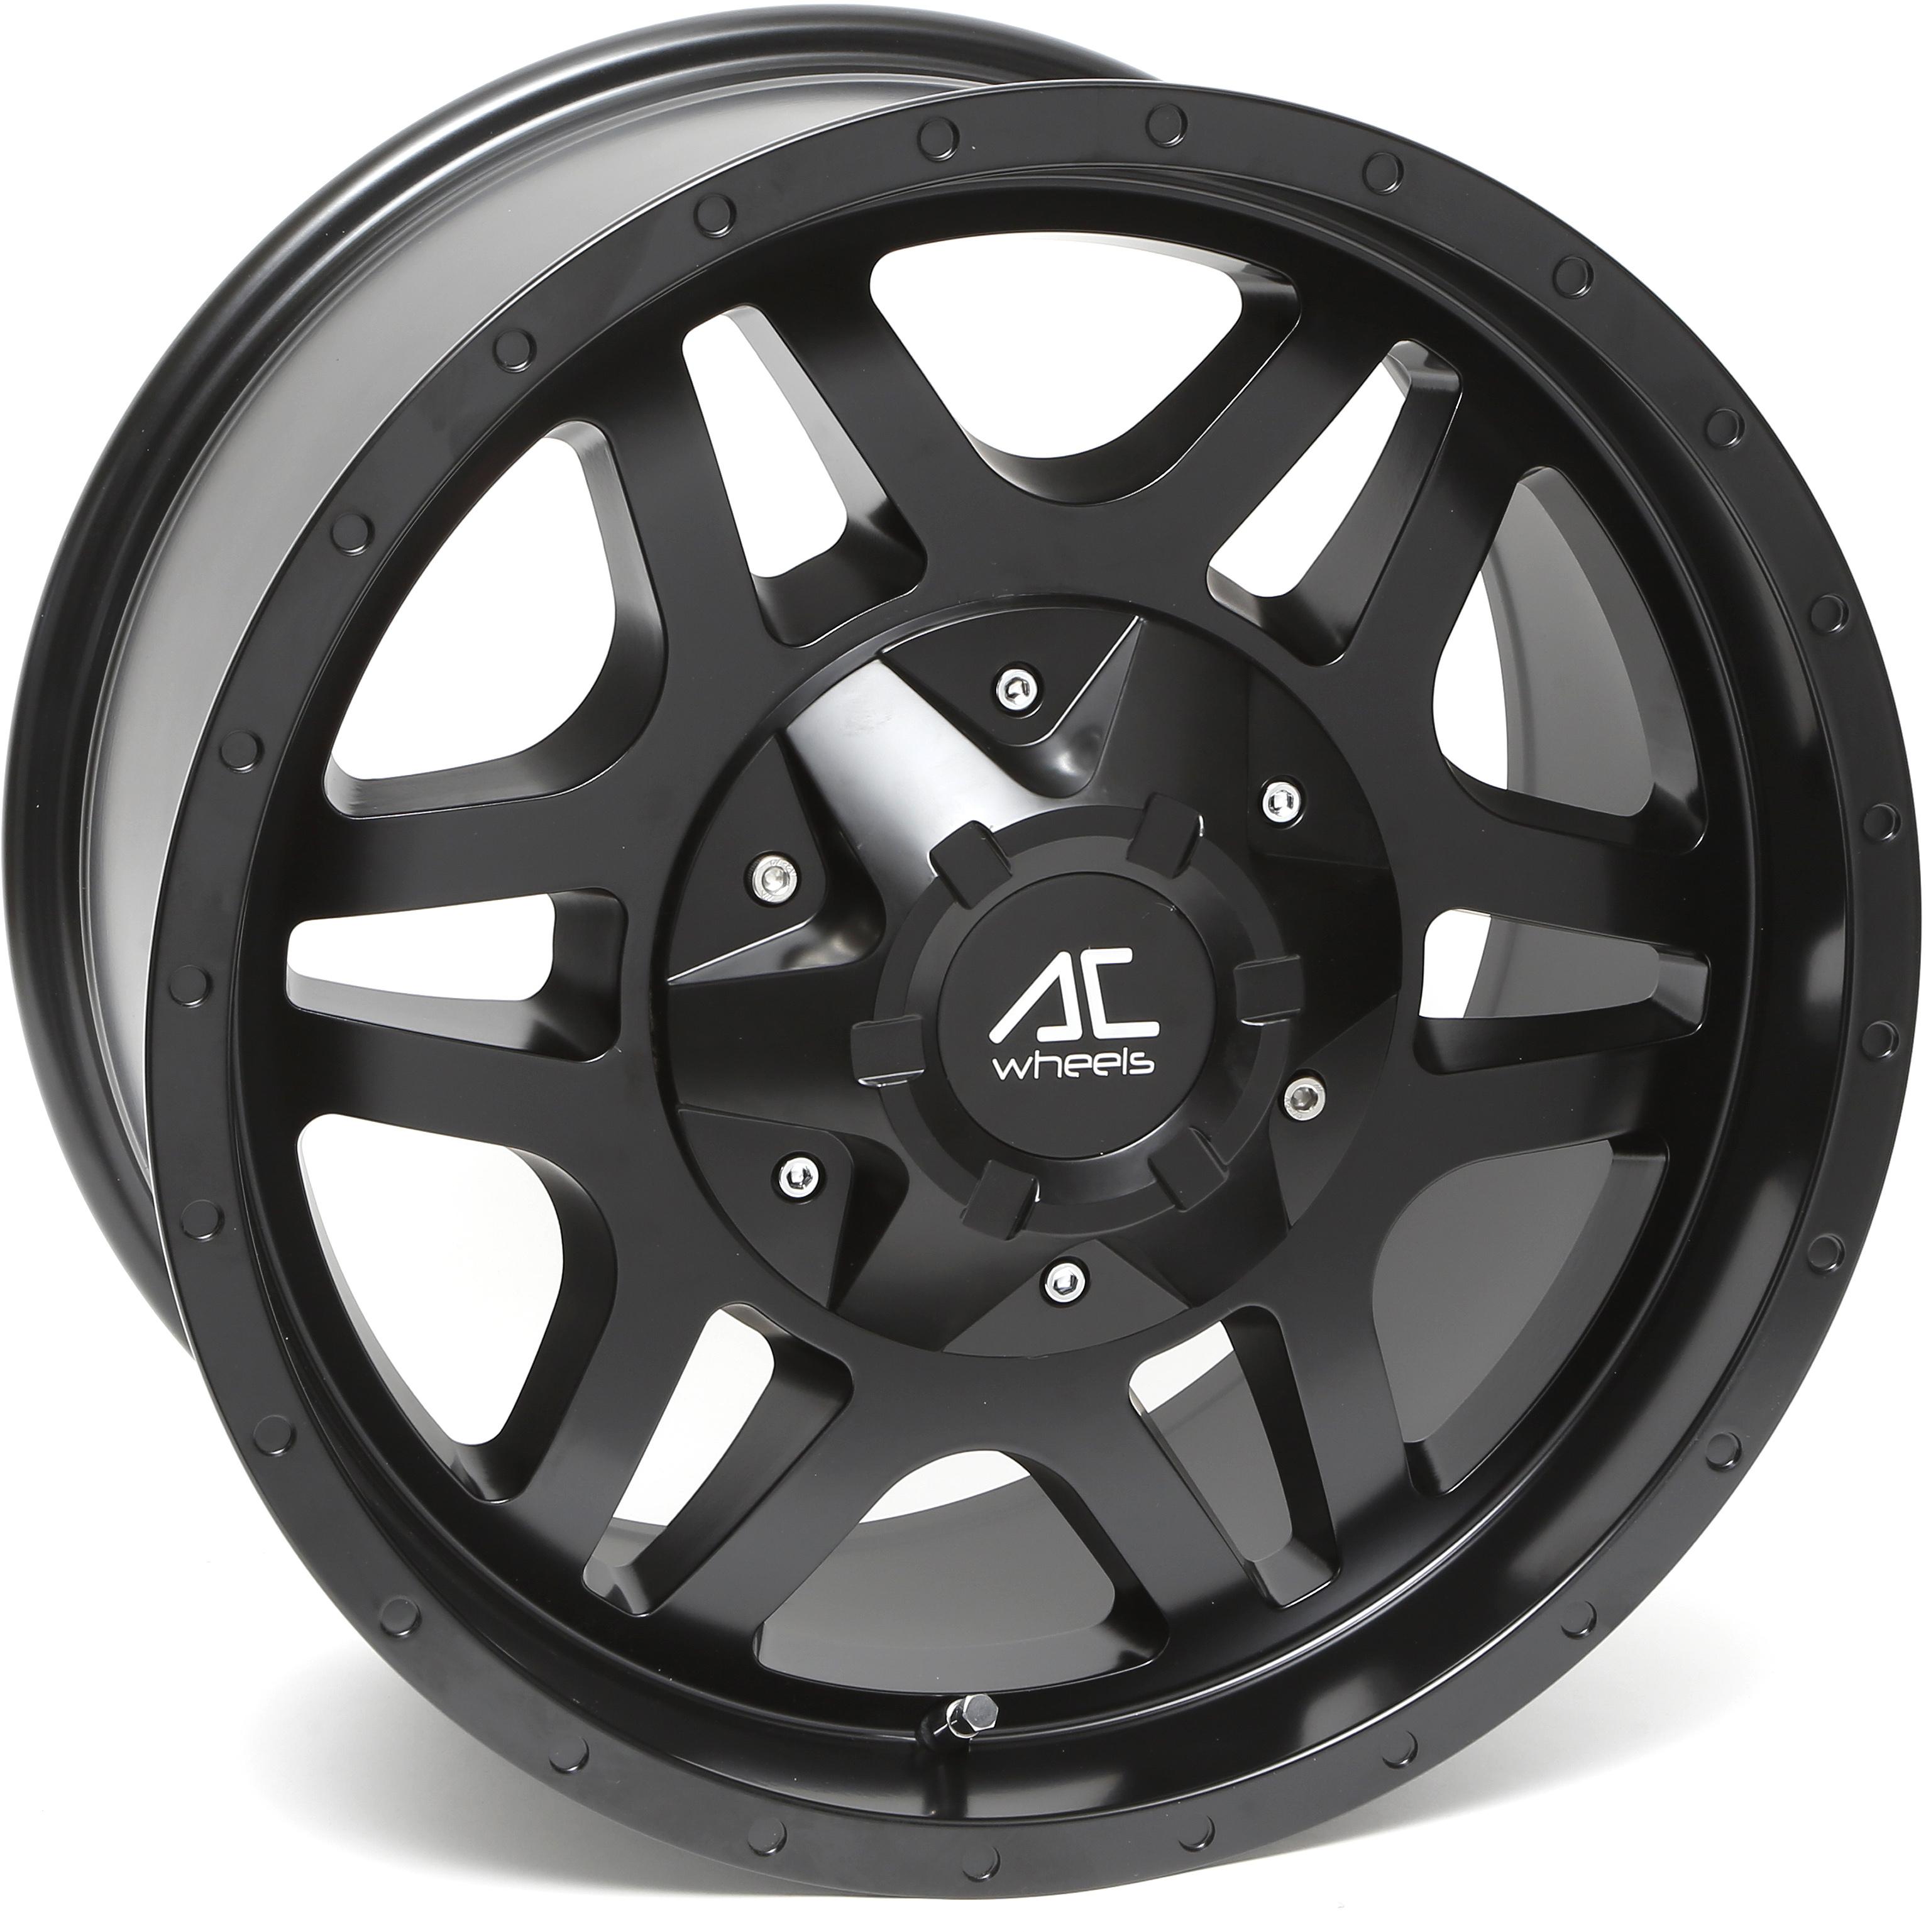 AC Wheels - SAVAGE (Matt Black)